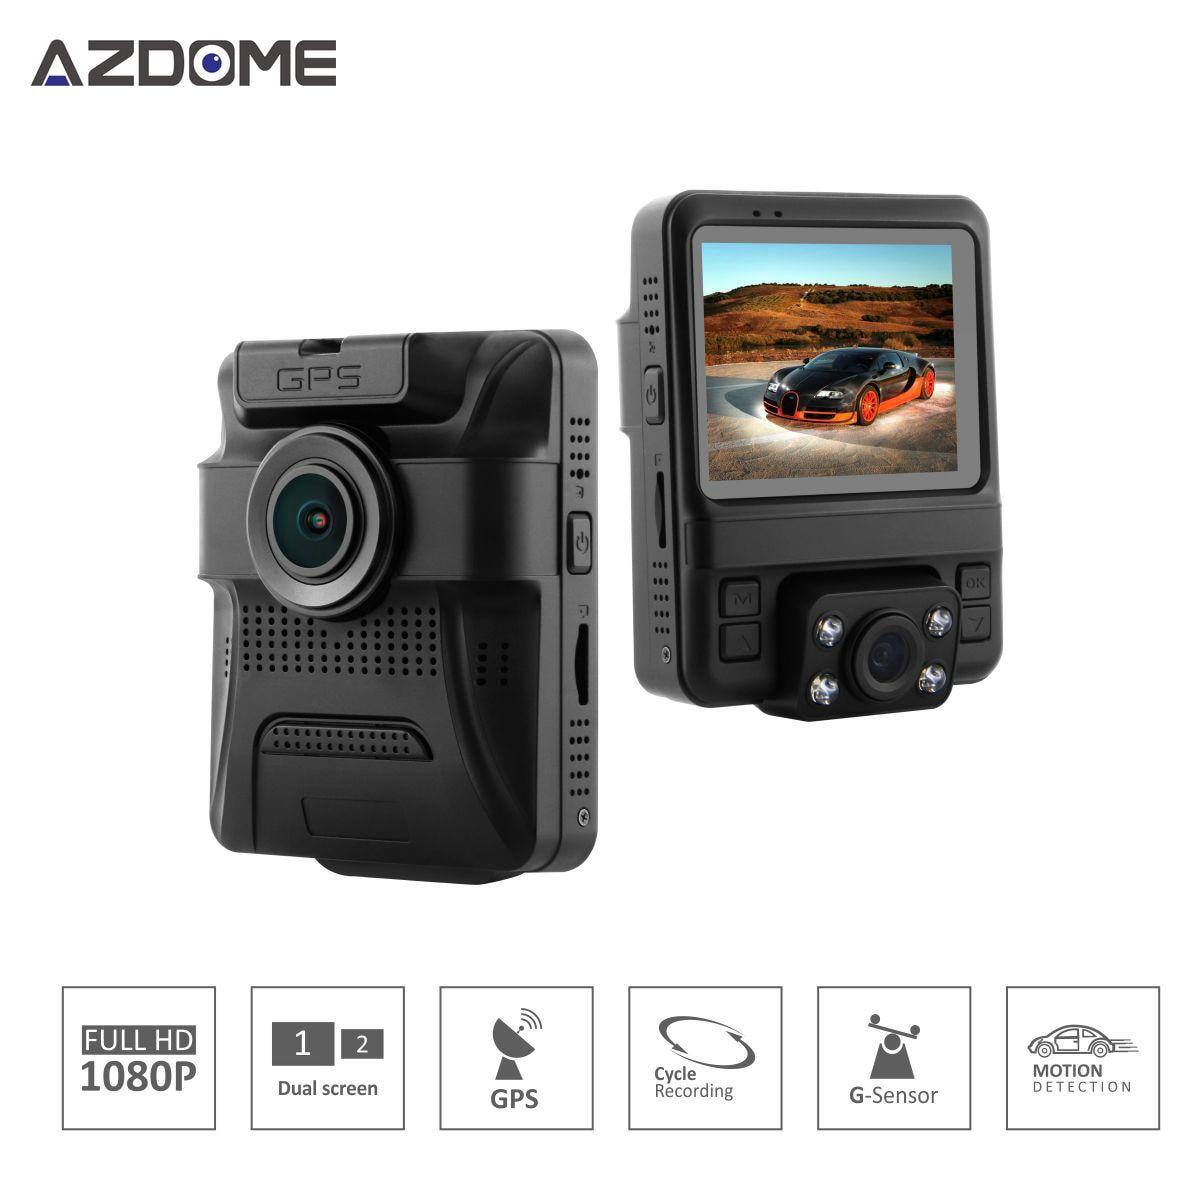 Azdome GS65H Mini Dual Lens Car DVR Dash Camera 1080P Full HD Novatek 96655 Video Recorder Built-in GPS Night Vision red line red line moto x style